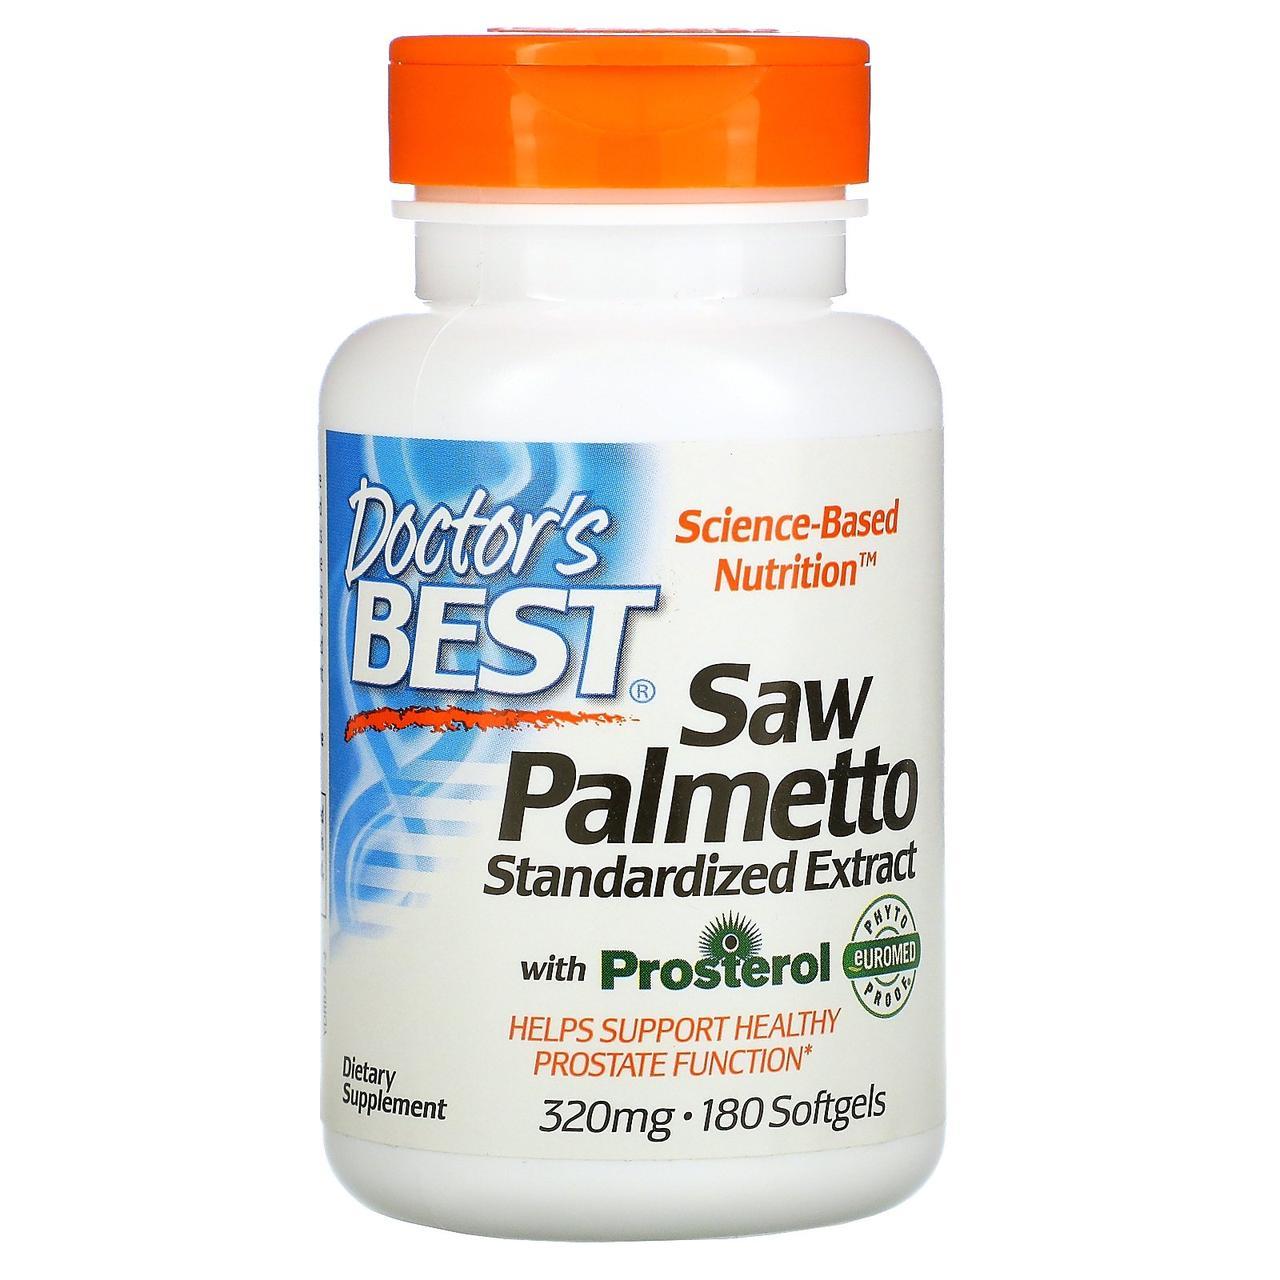 Doctor's Best, Euromed, пальма сереноа, стандартизованный экстракт, 320 мг, 180 мягких таблеток